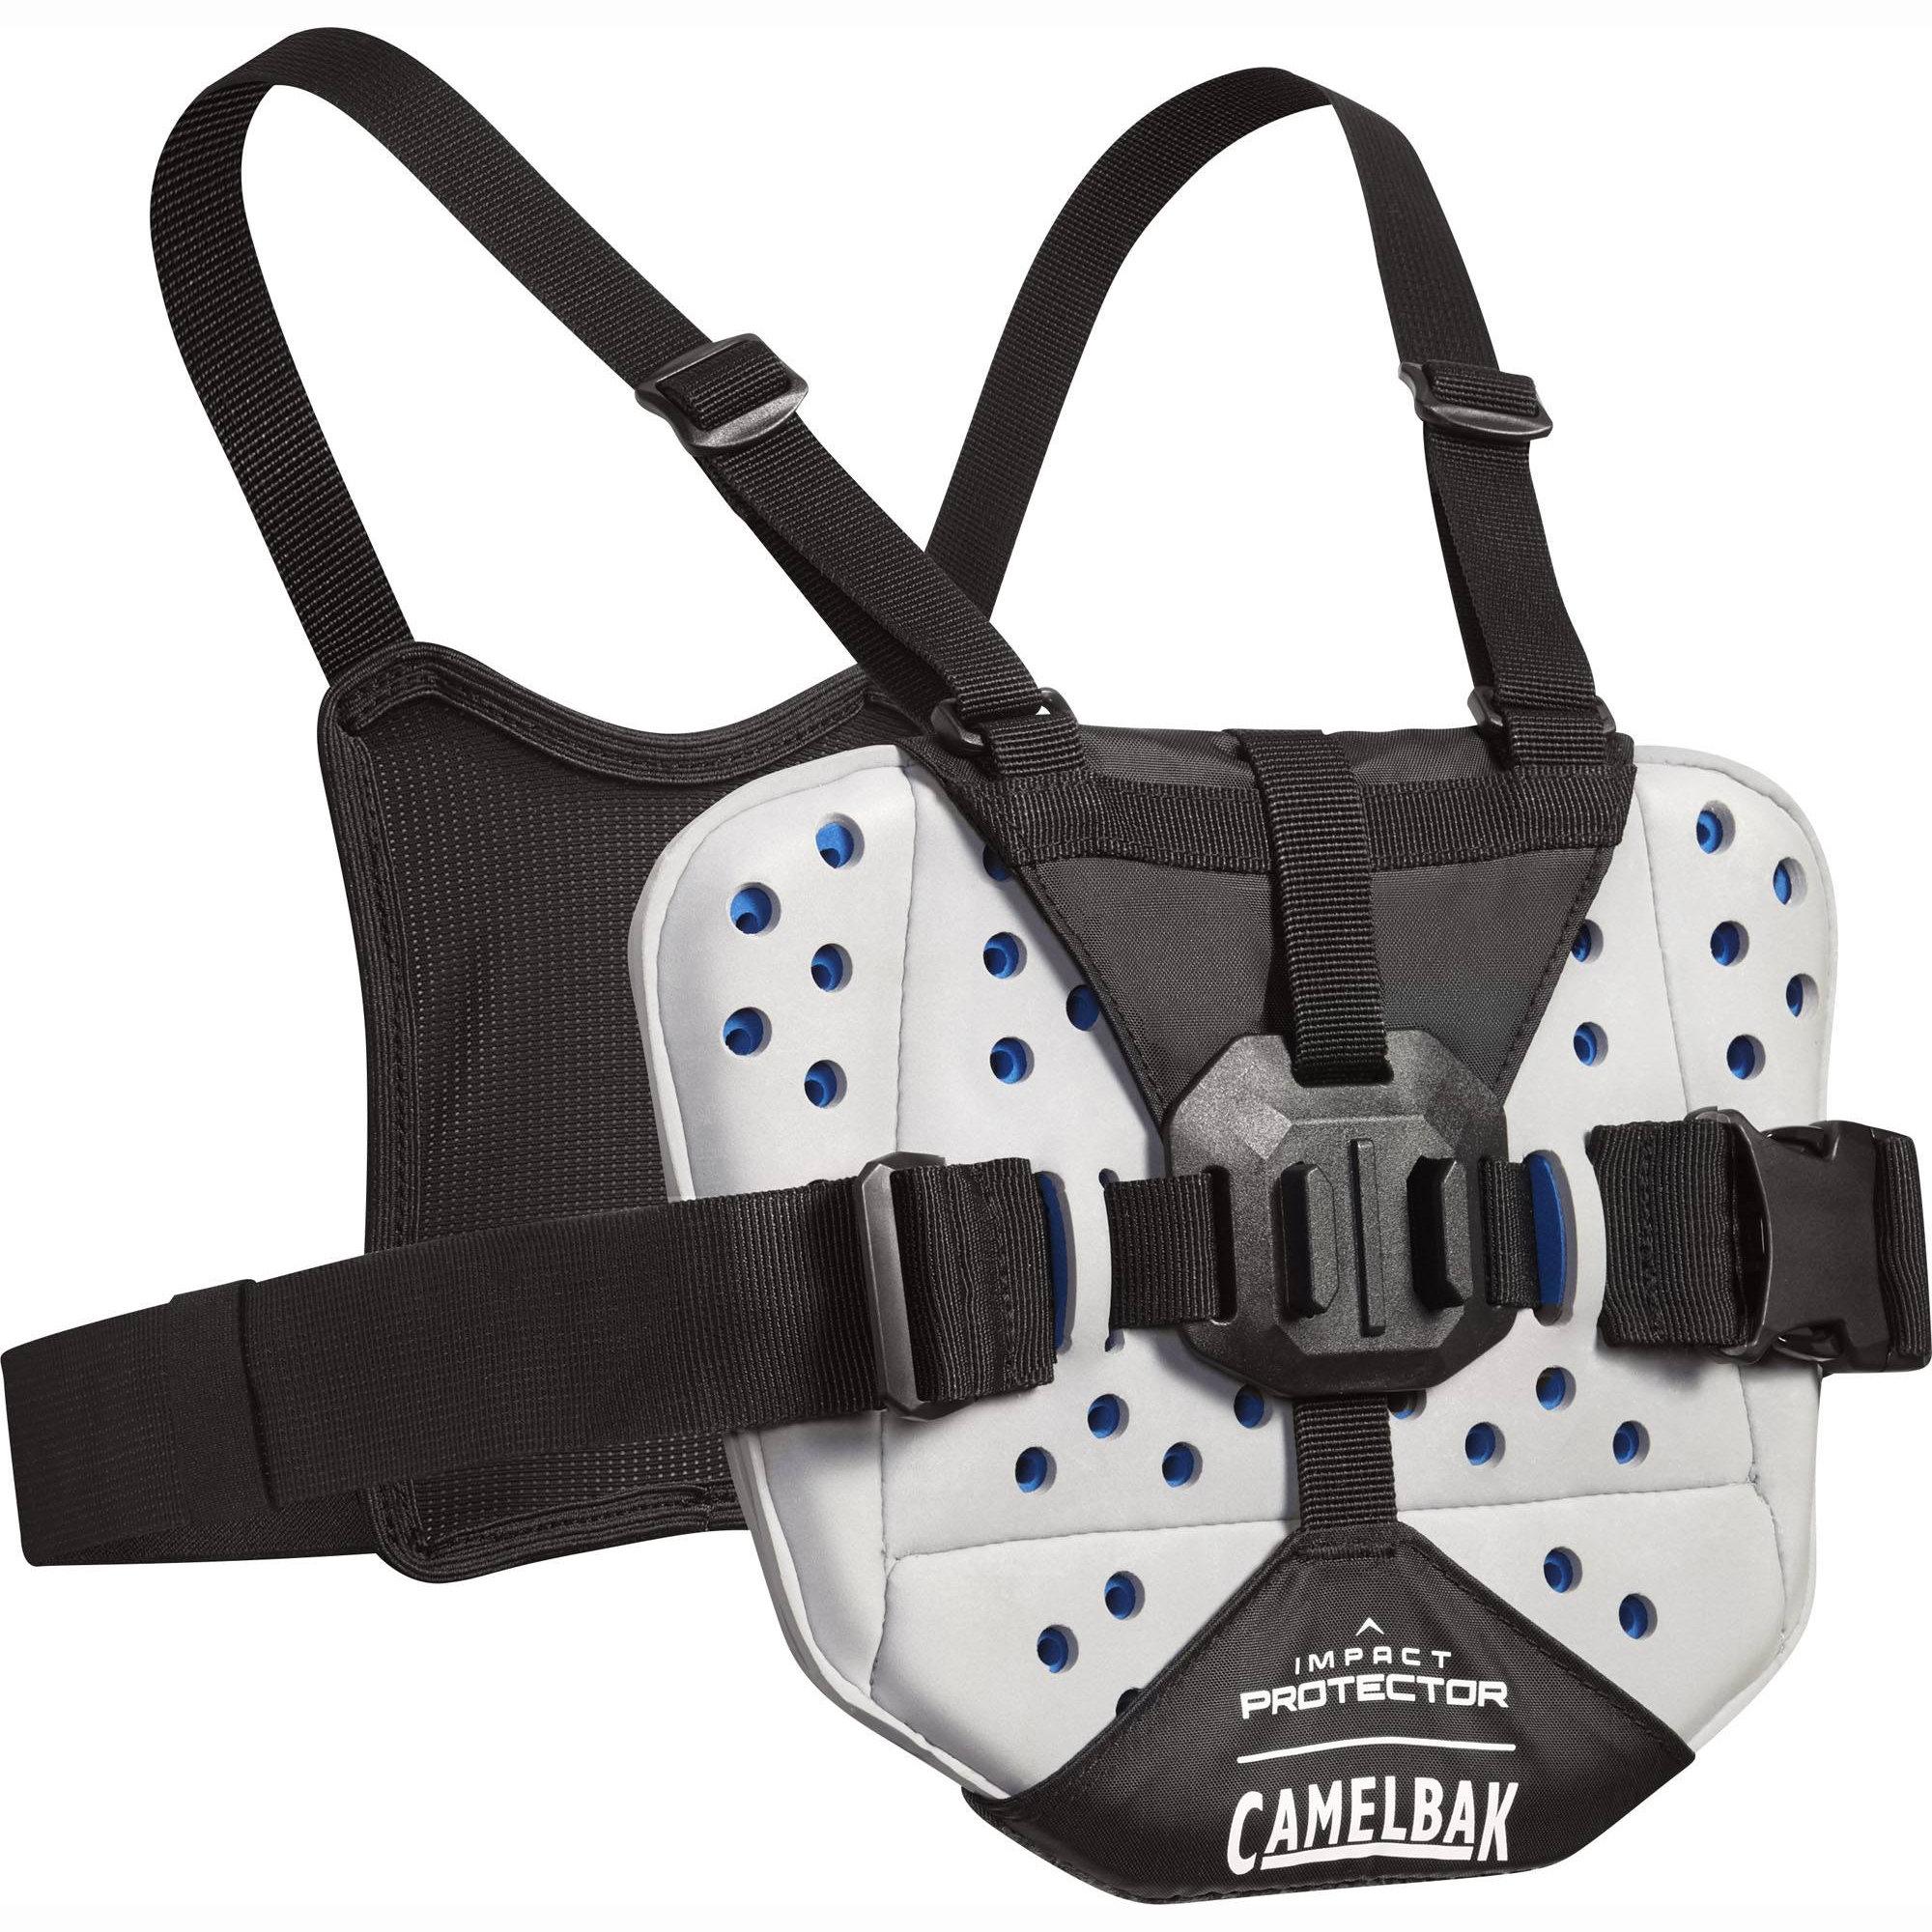 MTB Camelbak Sternum Protector - Brustschutz